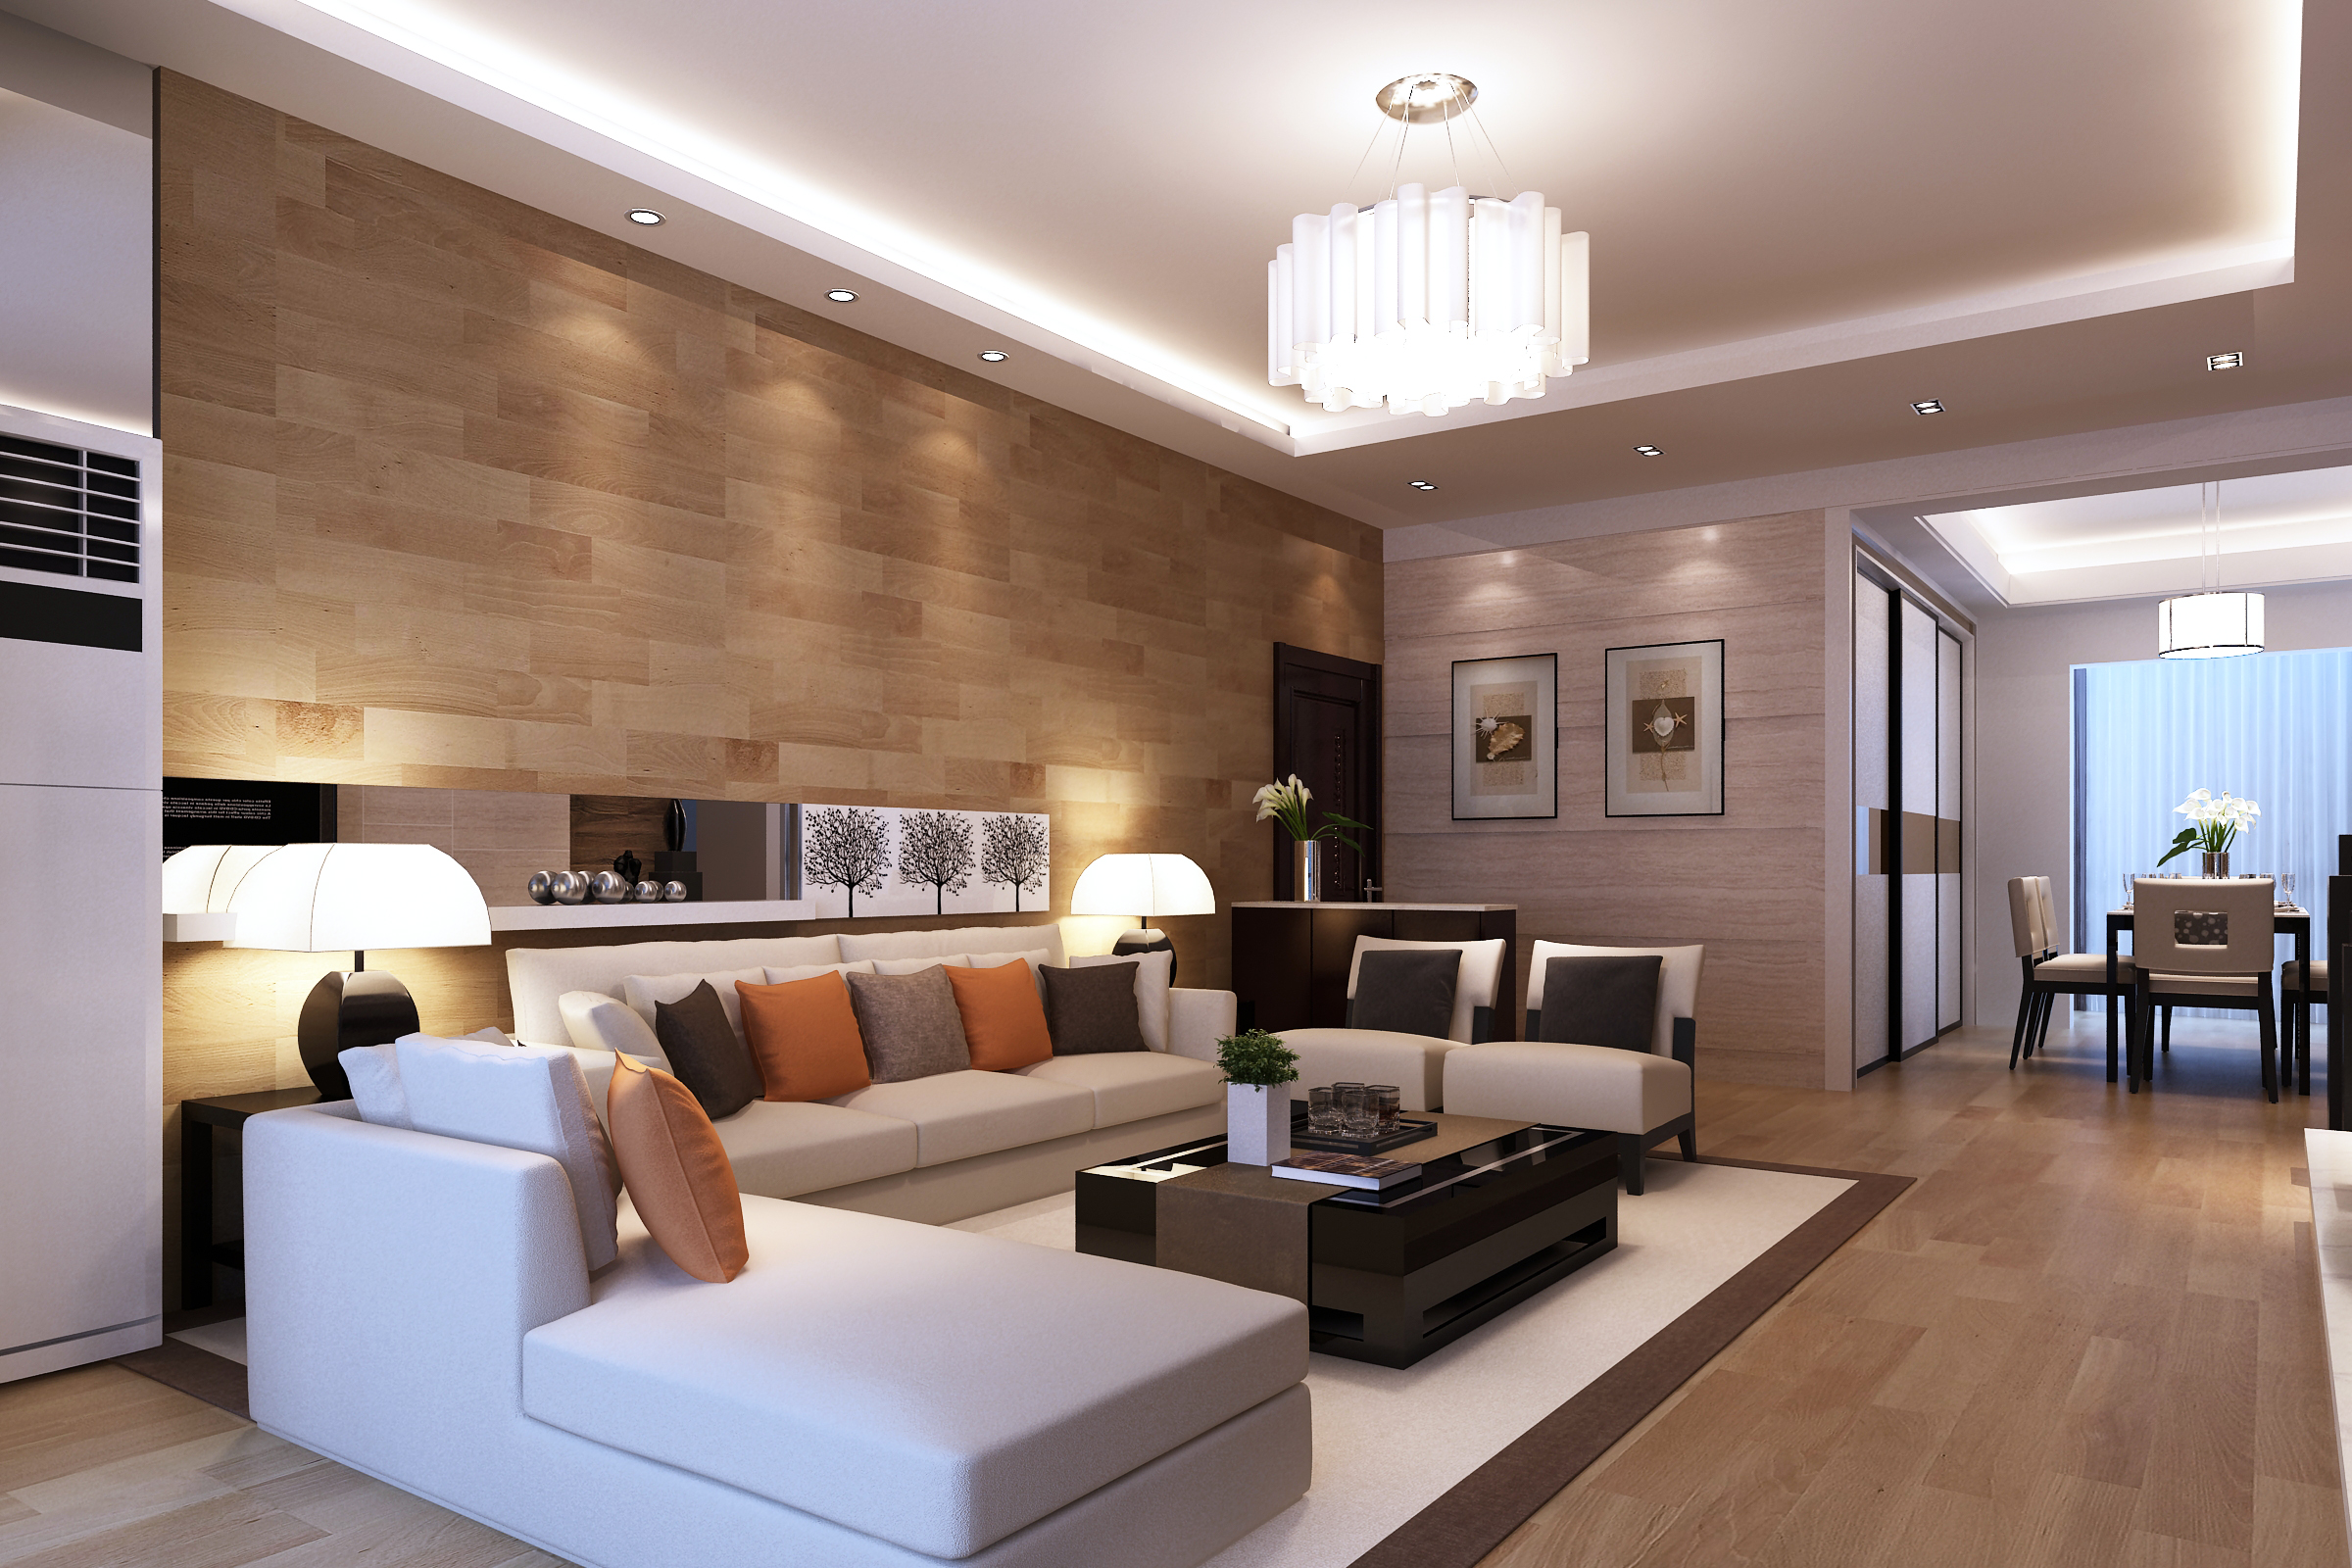 l living room ideas Modern Living Room Design Ideas Uk Best » ConnectorCountry.com 1600 X 2400